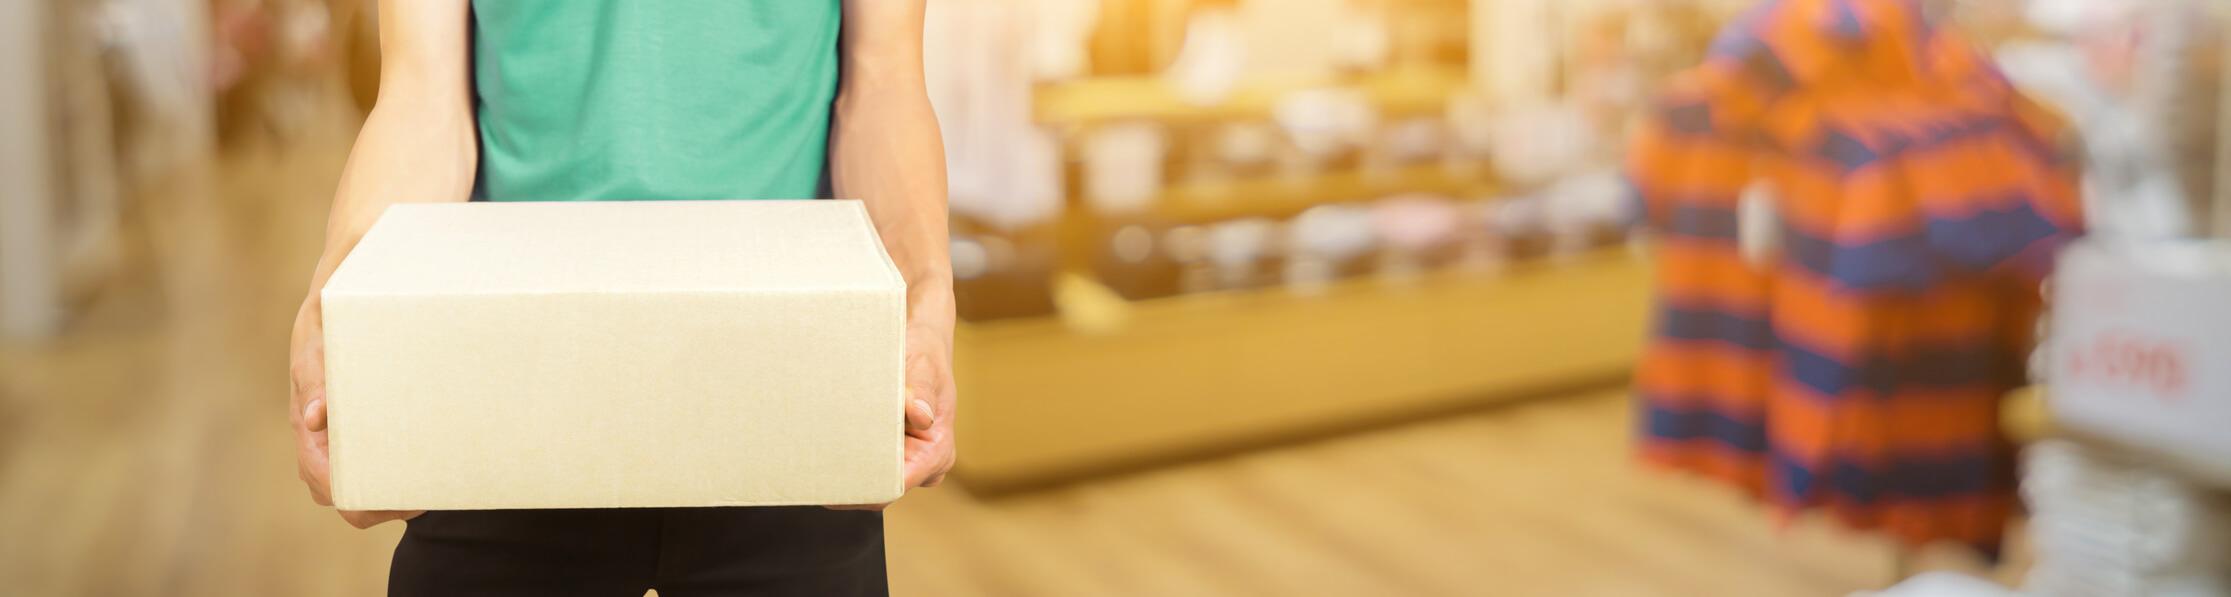 ratgeber bestellung retournieren bei otto so geht 39 s schritt f r schritt. Black Bedroom Furniture Sets. Home Design Ideas